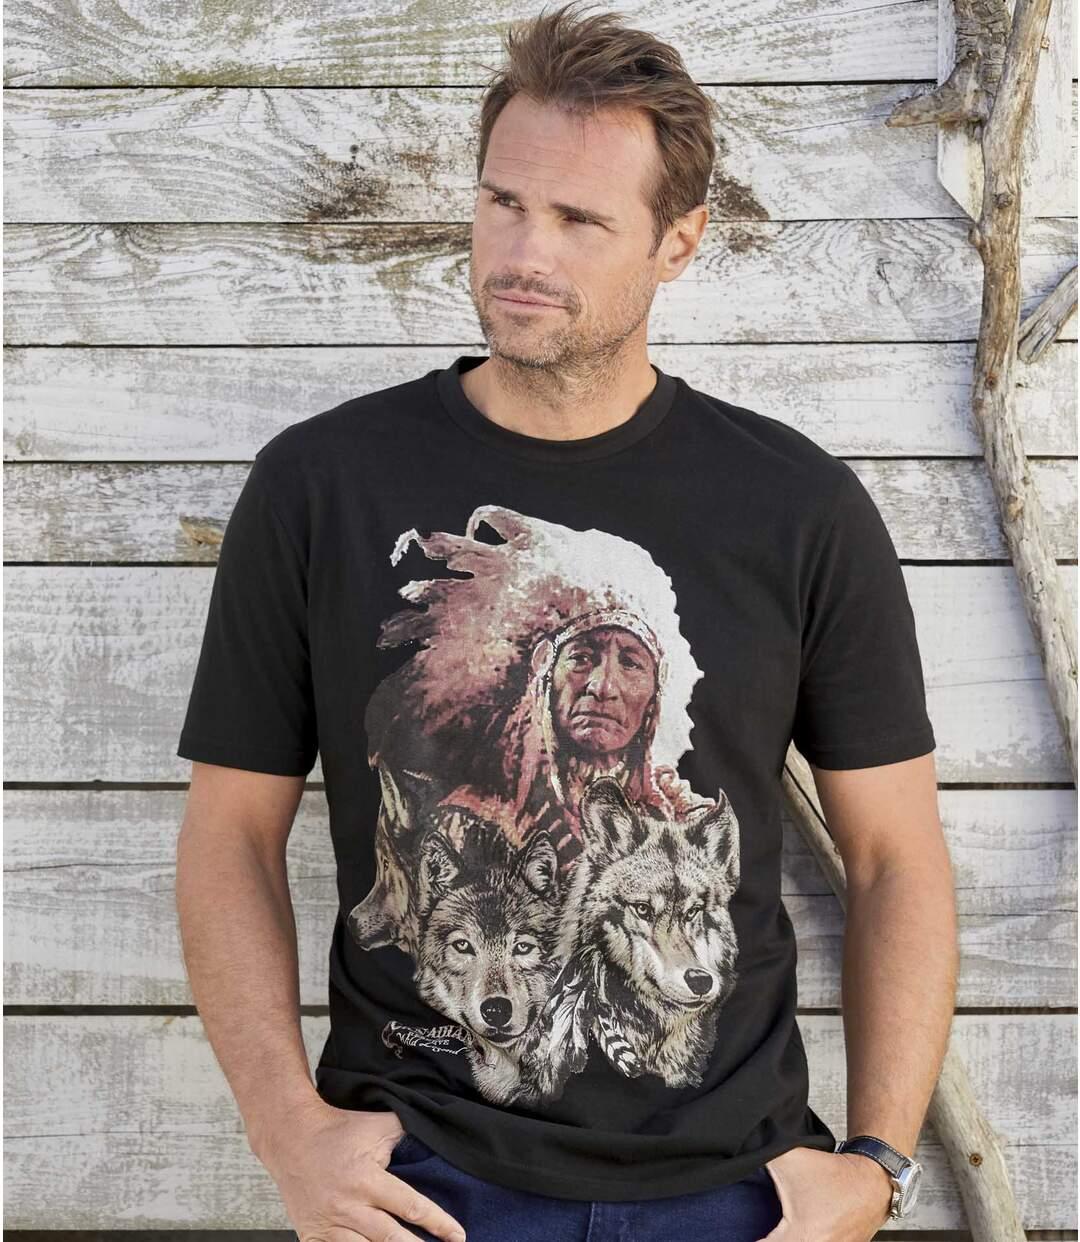 Atlas for Men - 15% auf den T-Shirt-Sale, zB.: Canadian Legends mit Motivdruck